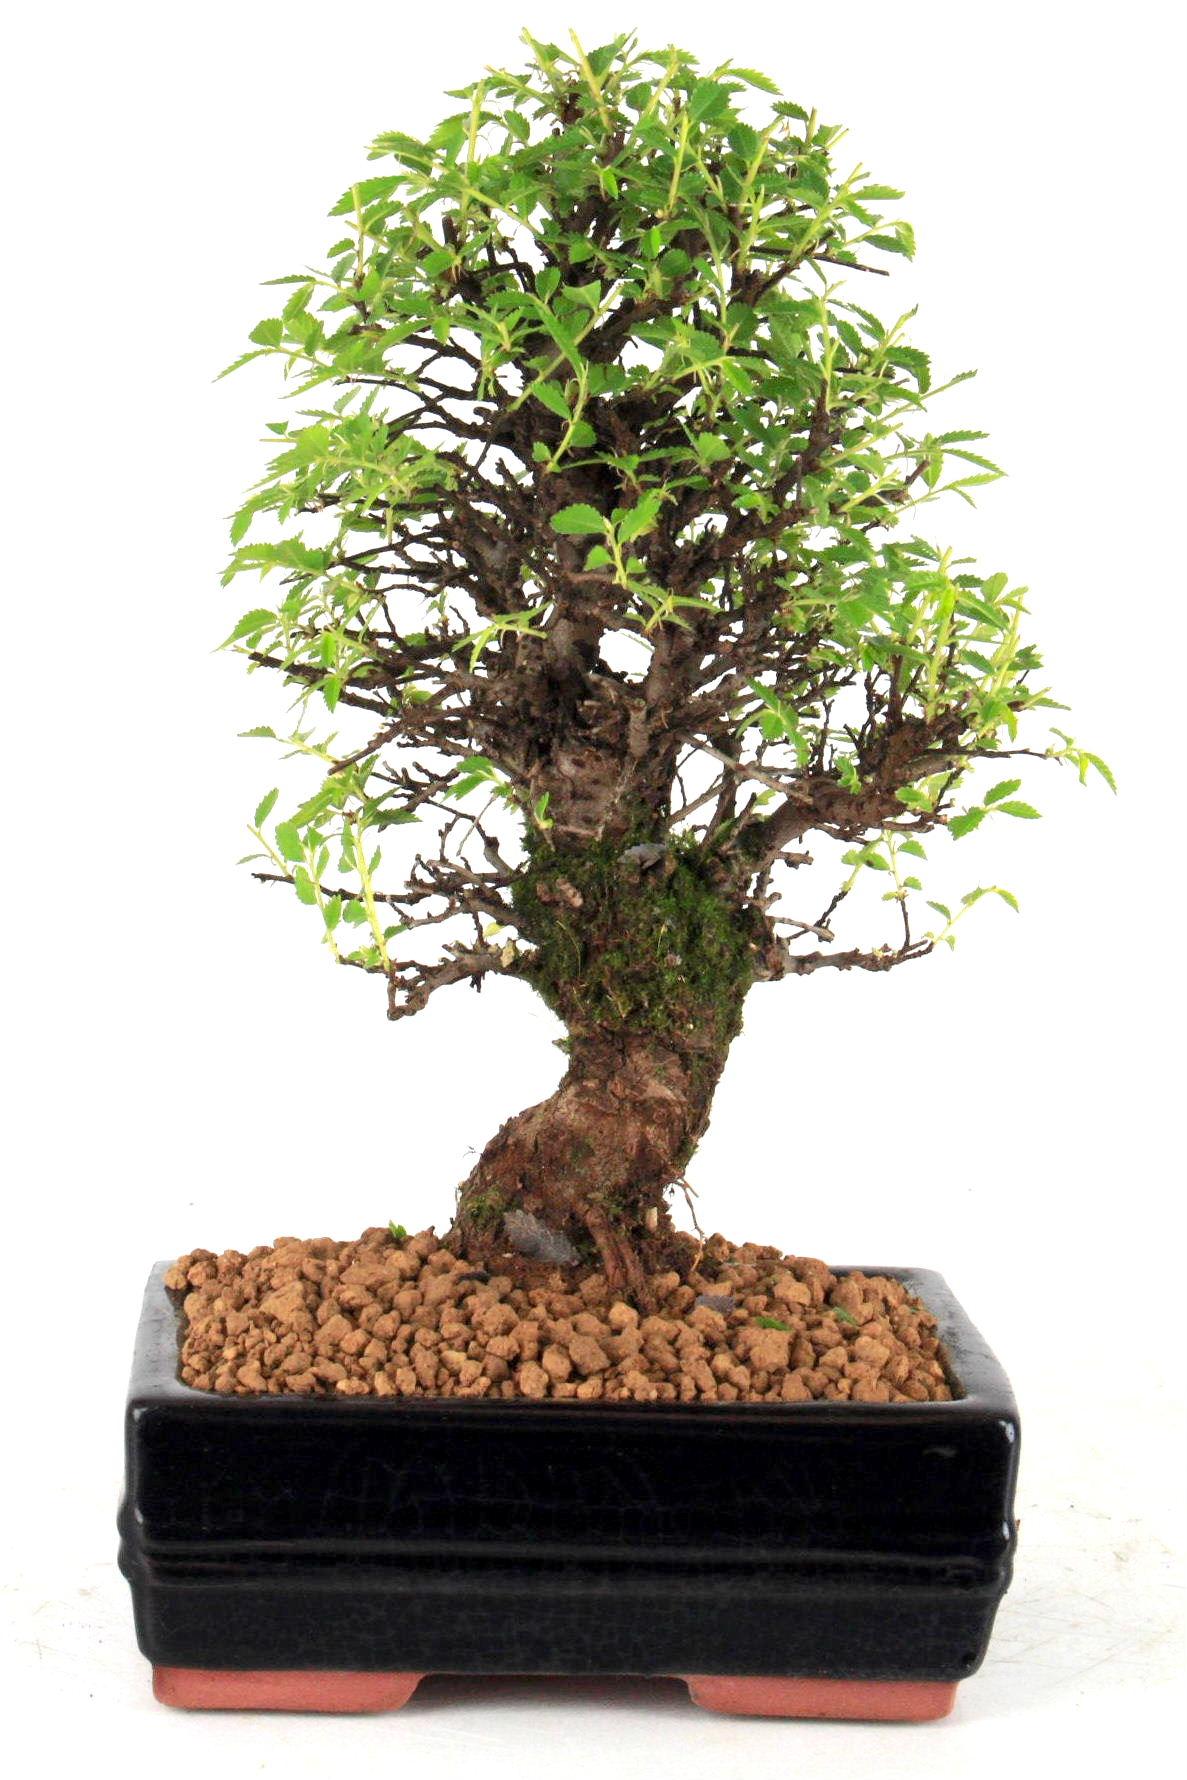 japanische ulme bonsai 29 cm 1610 bei oyaki bonsai kaufen. Black Bedroom Furniture Sets. Home Design Ideas